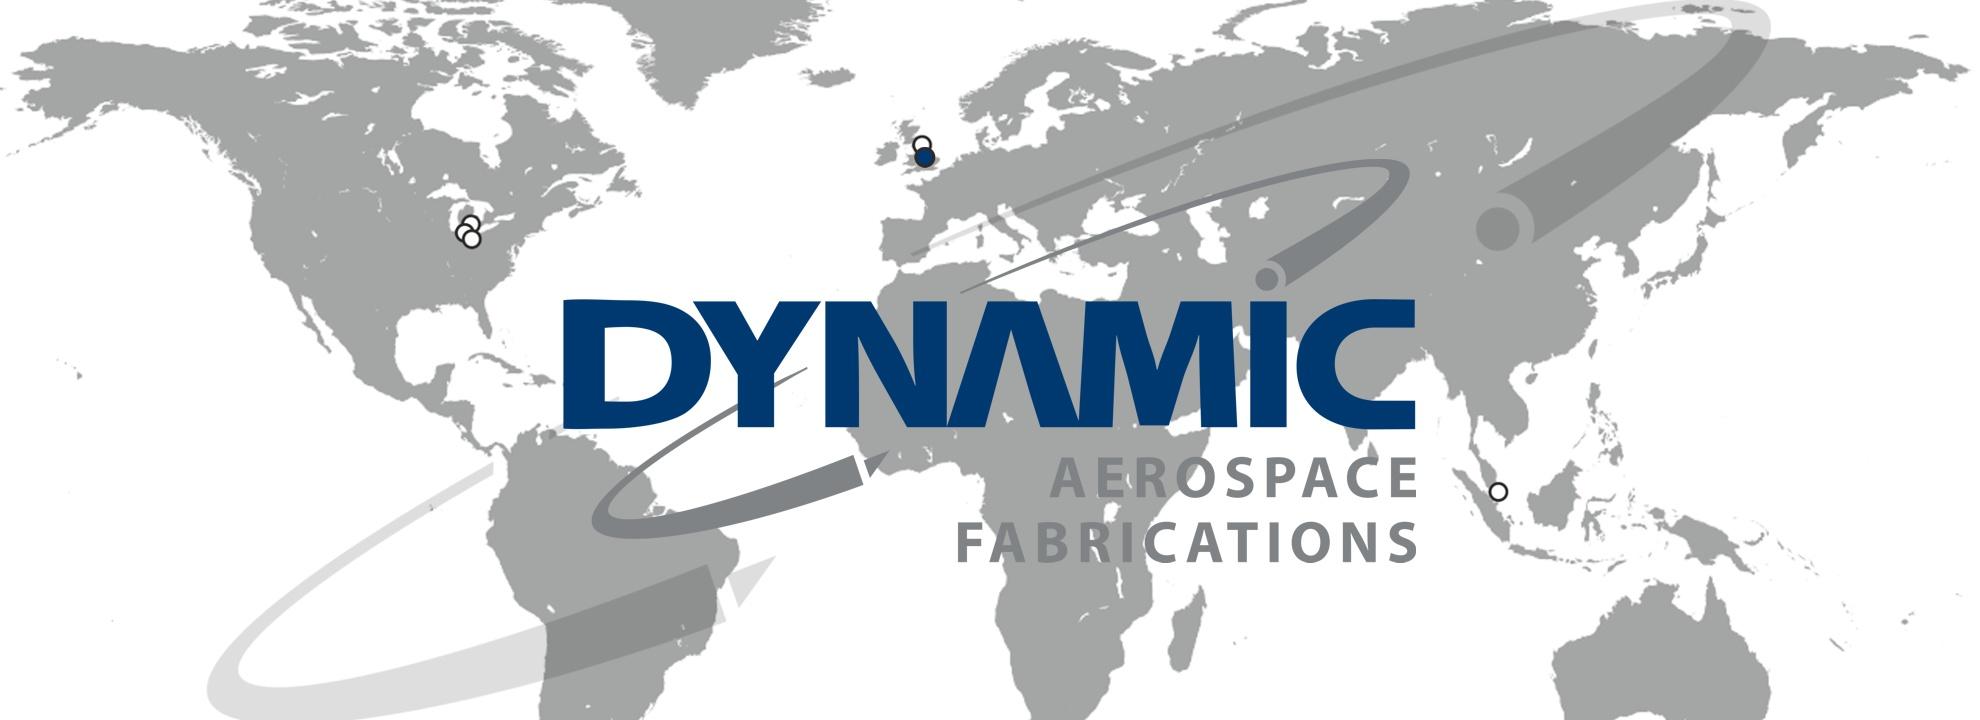 Dynamic Aerospace Fabrications banner